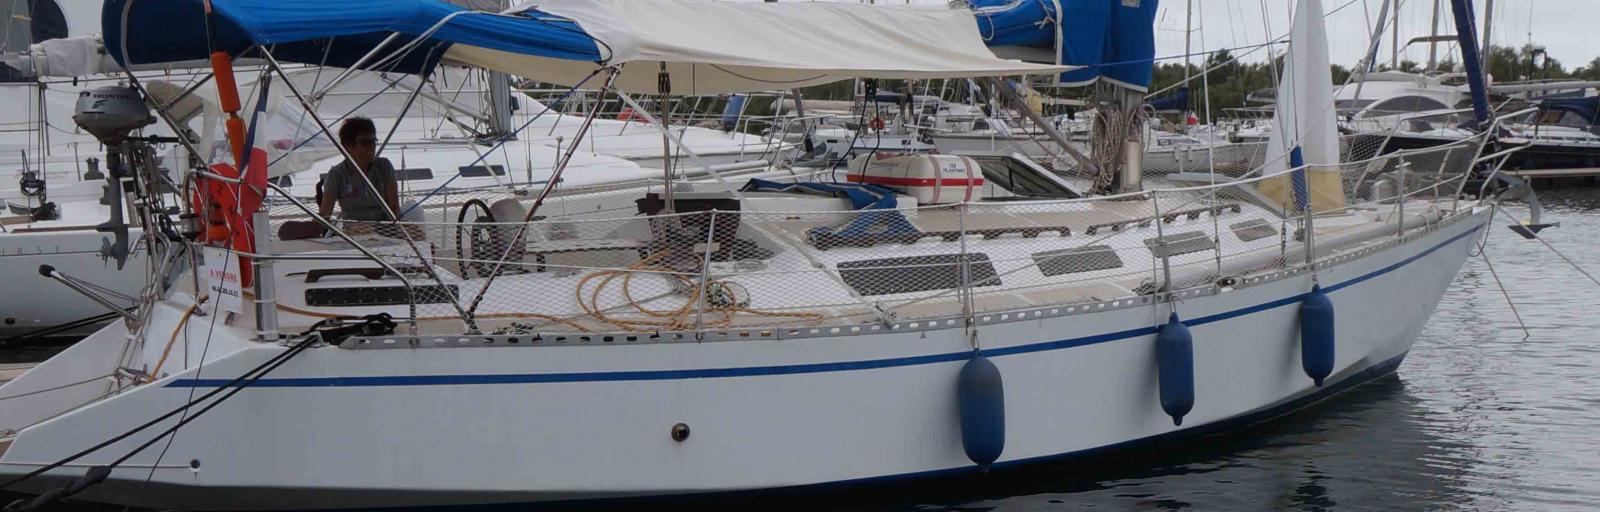 AYC YachtBroker - KM 1050